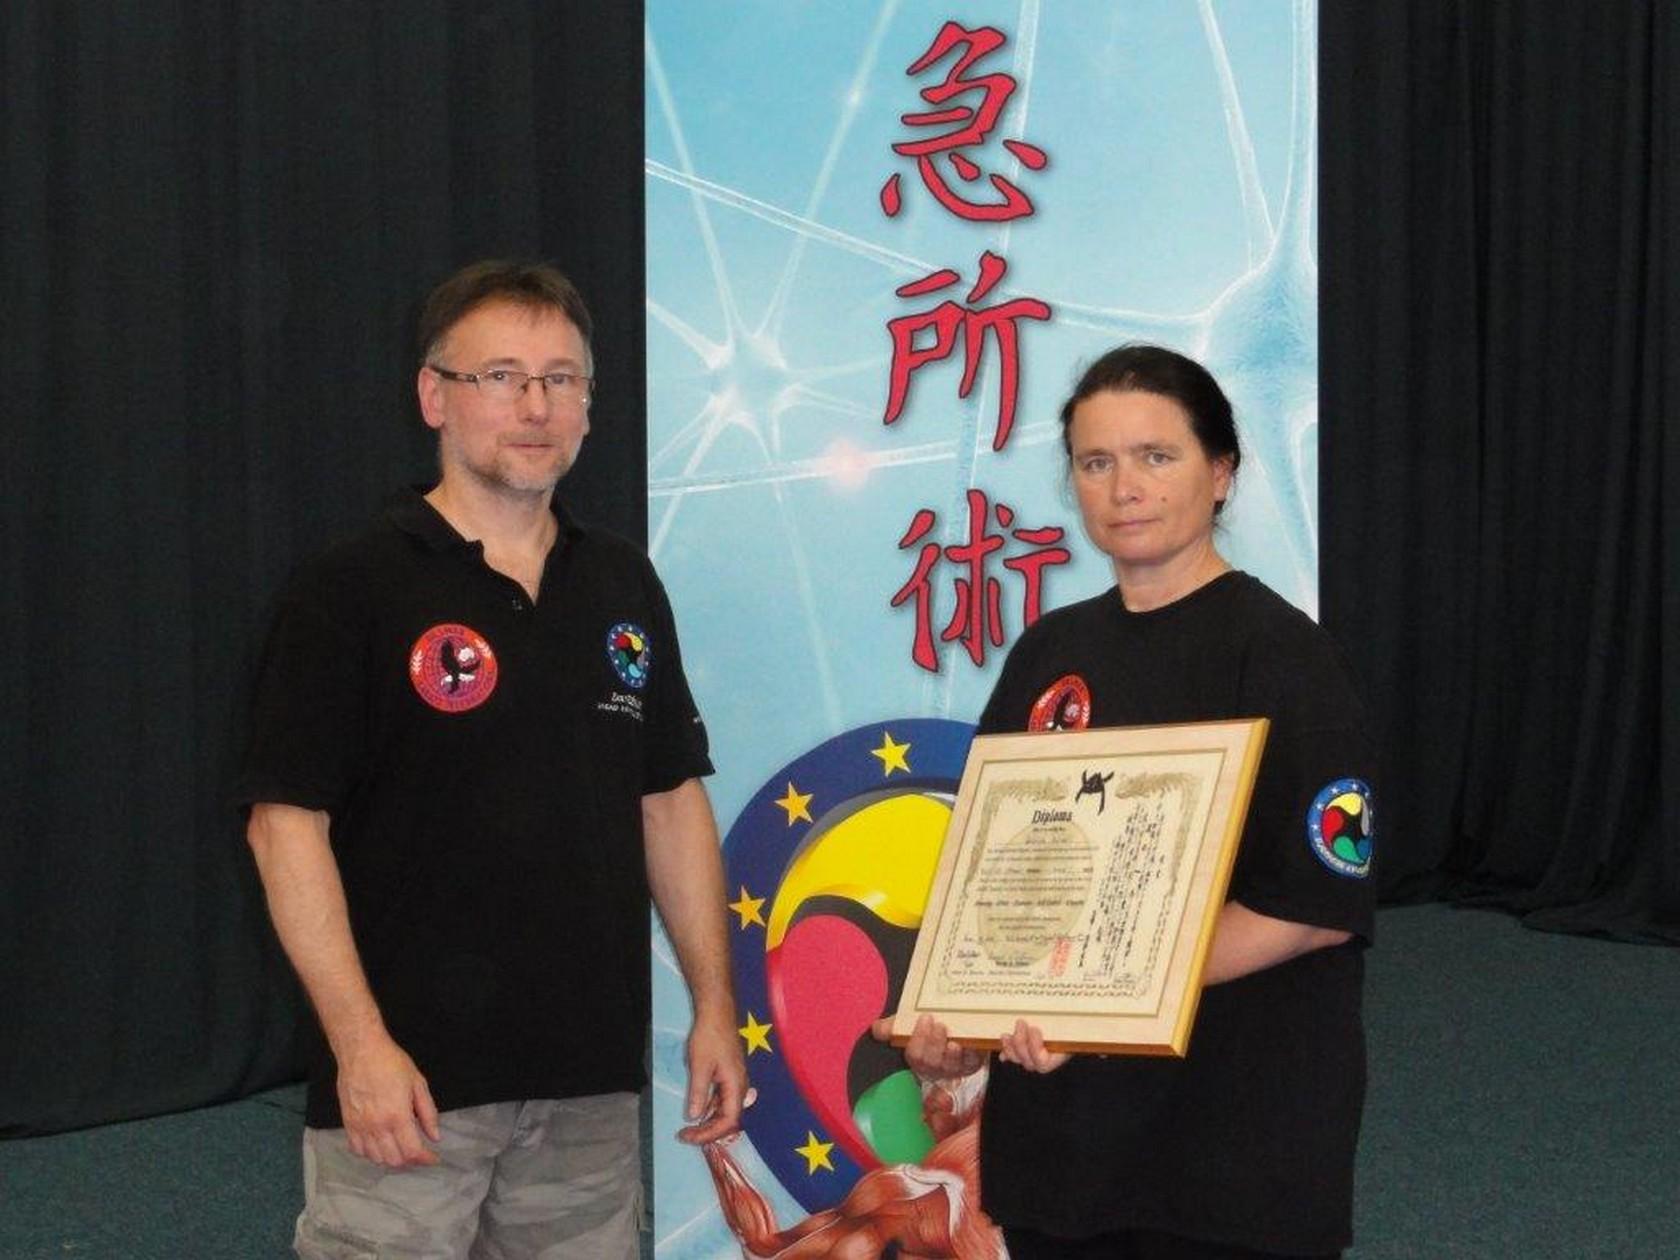 Urkundenverleihung: Gabriele Dziruni (EKA Kyusho Level 4) bekommt den 1. Dan Kyusho - Dillmann Karate